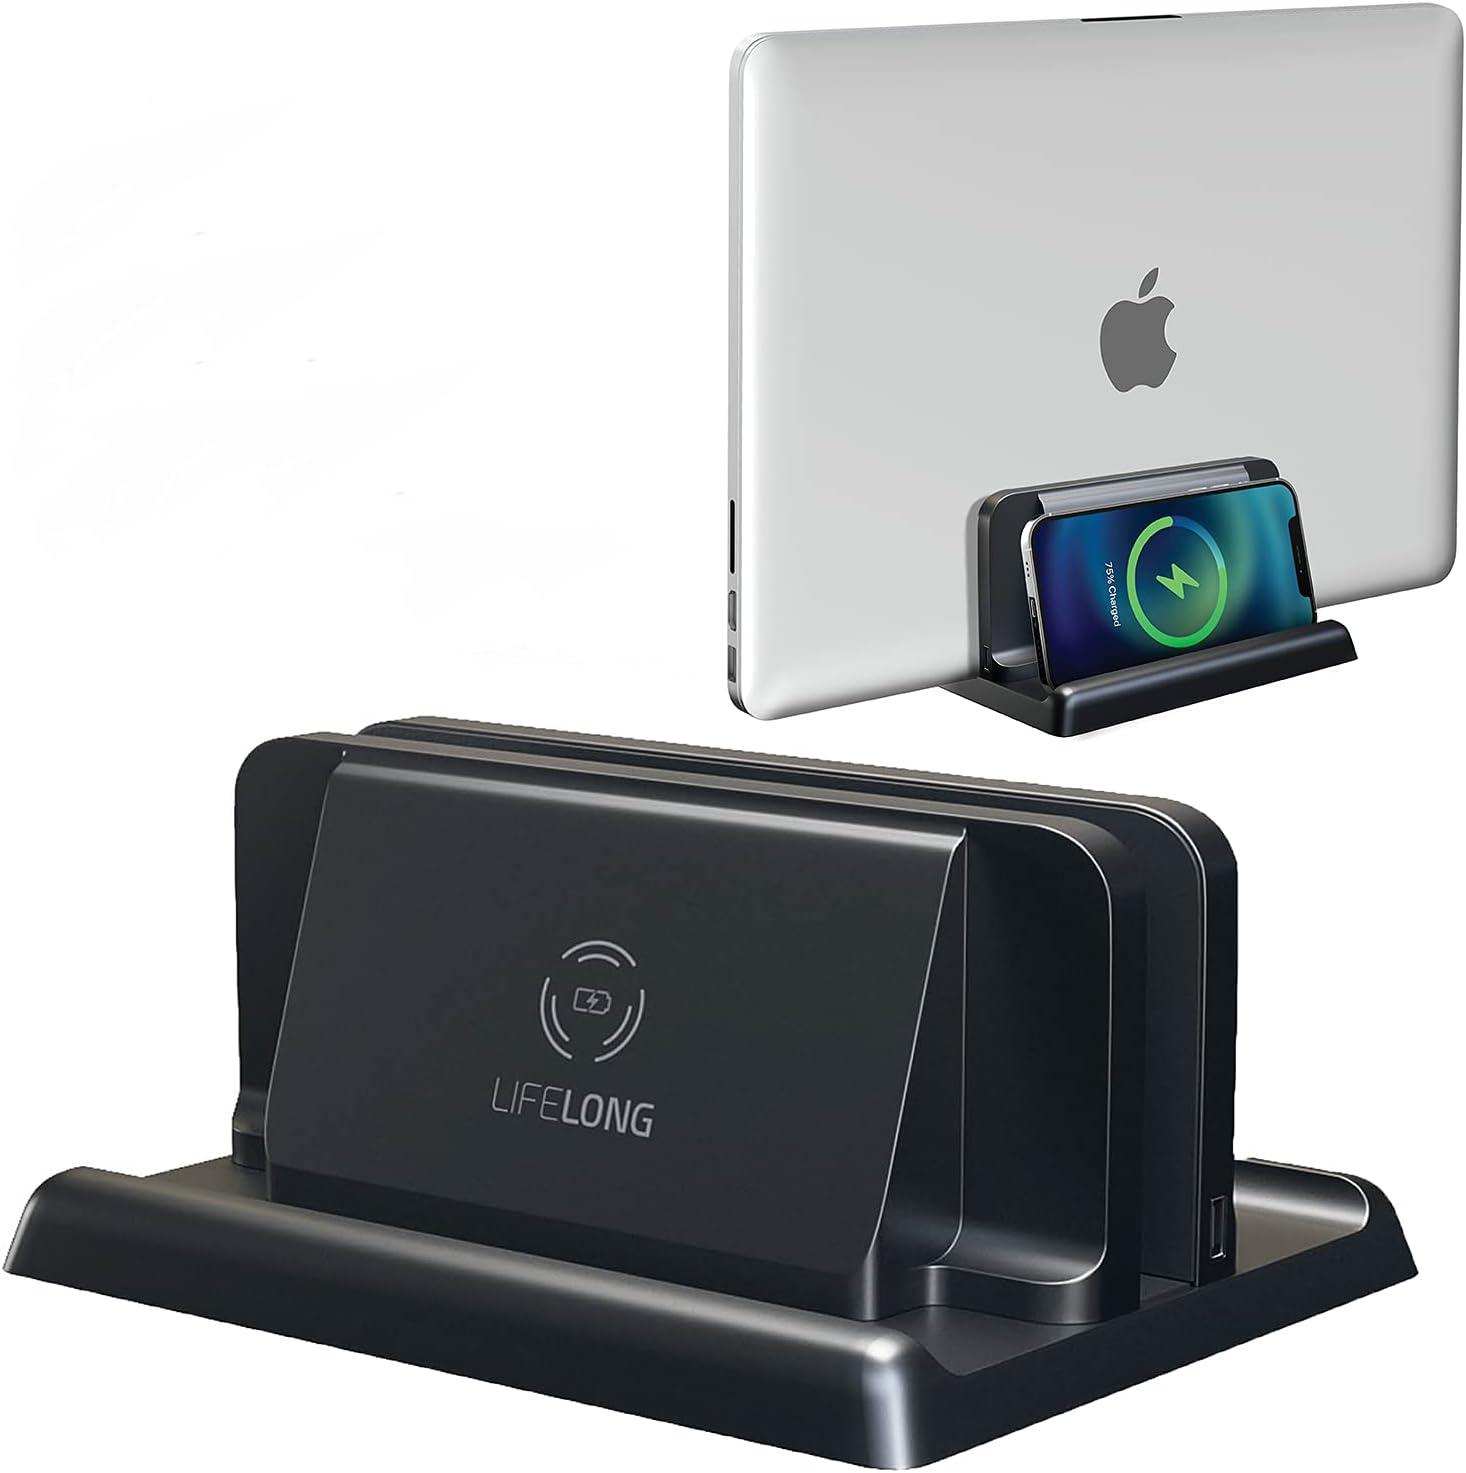 Vertical Laptop Choice Holder Desk Dock Over item handling Wireless Phone Charging